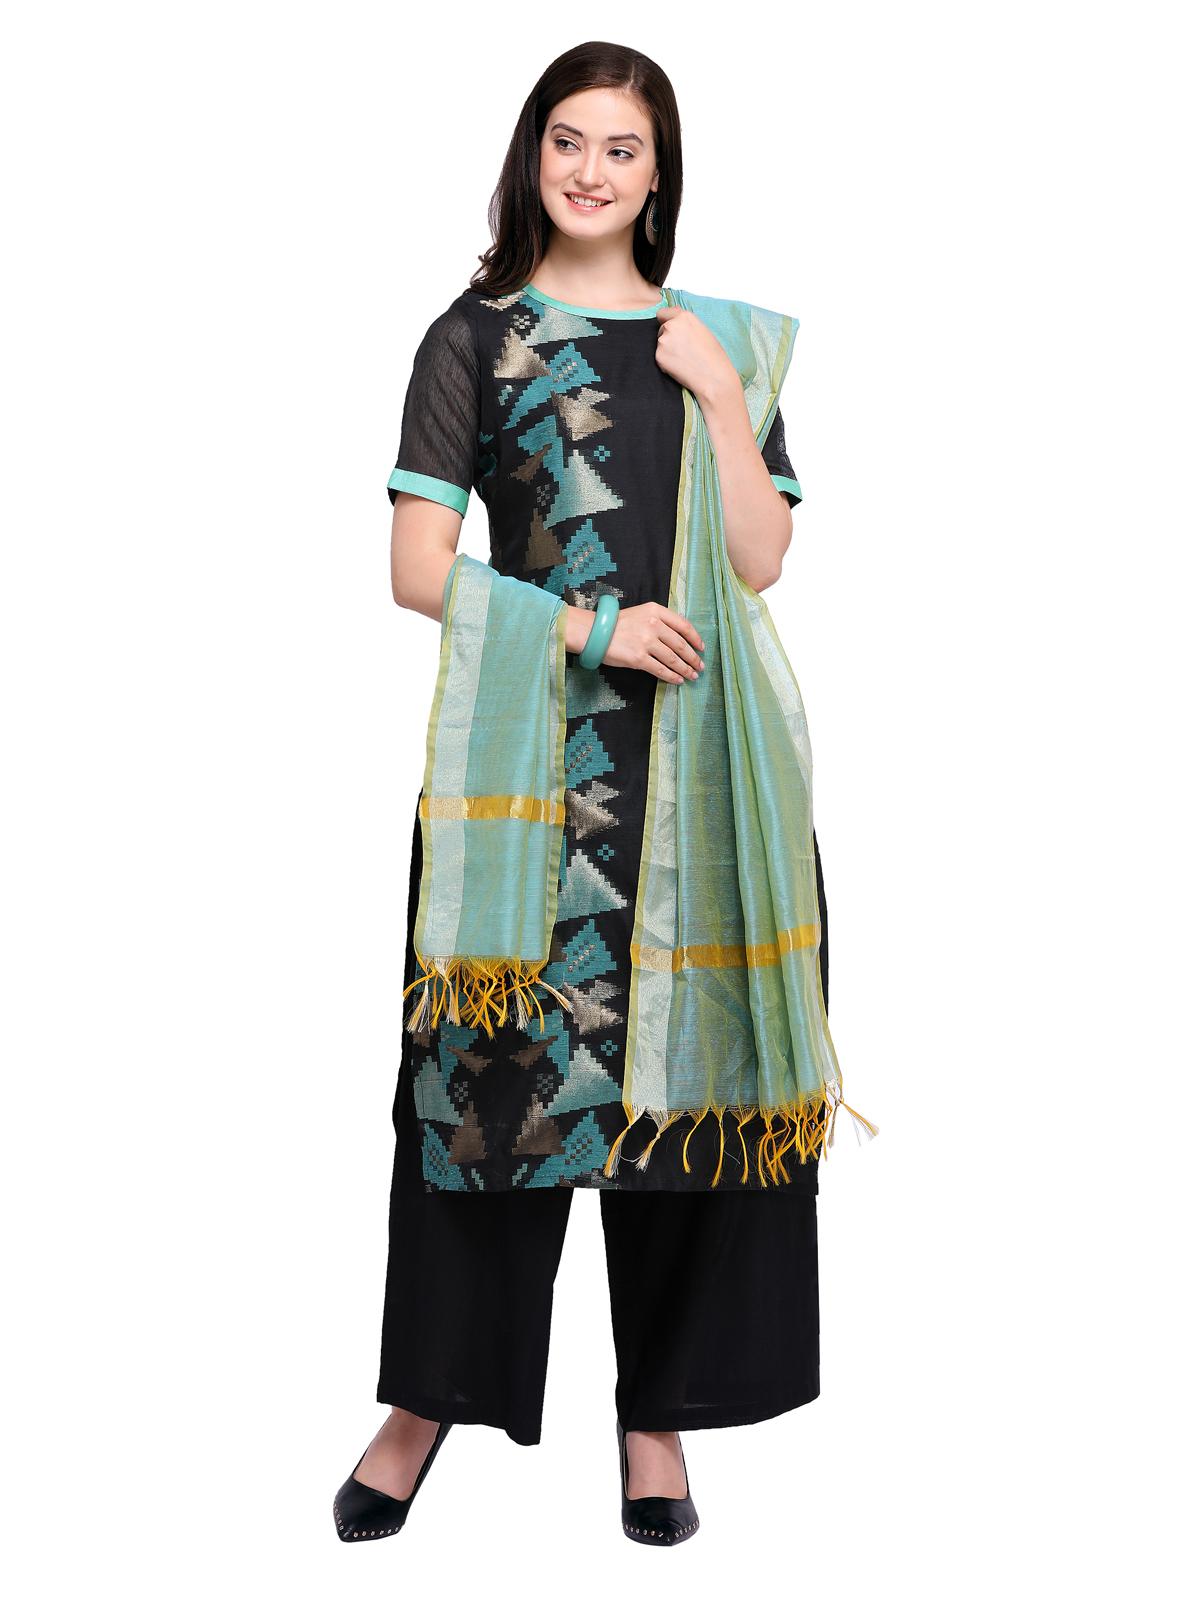 5040ce345a Inddus Black Chanderi Cotton Woven Unstitched Dress Material With Dupatta -  Inddus - 2716541